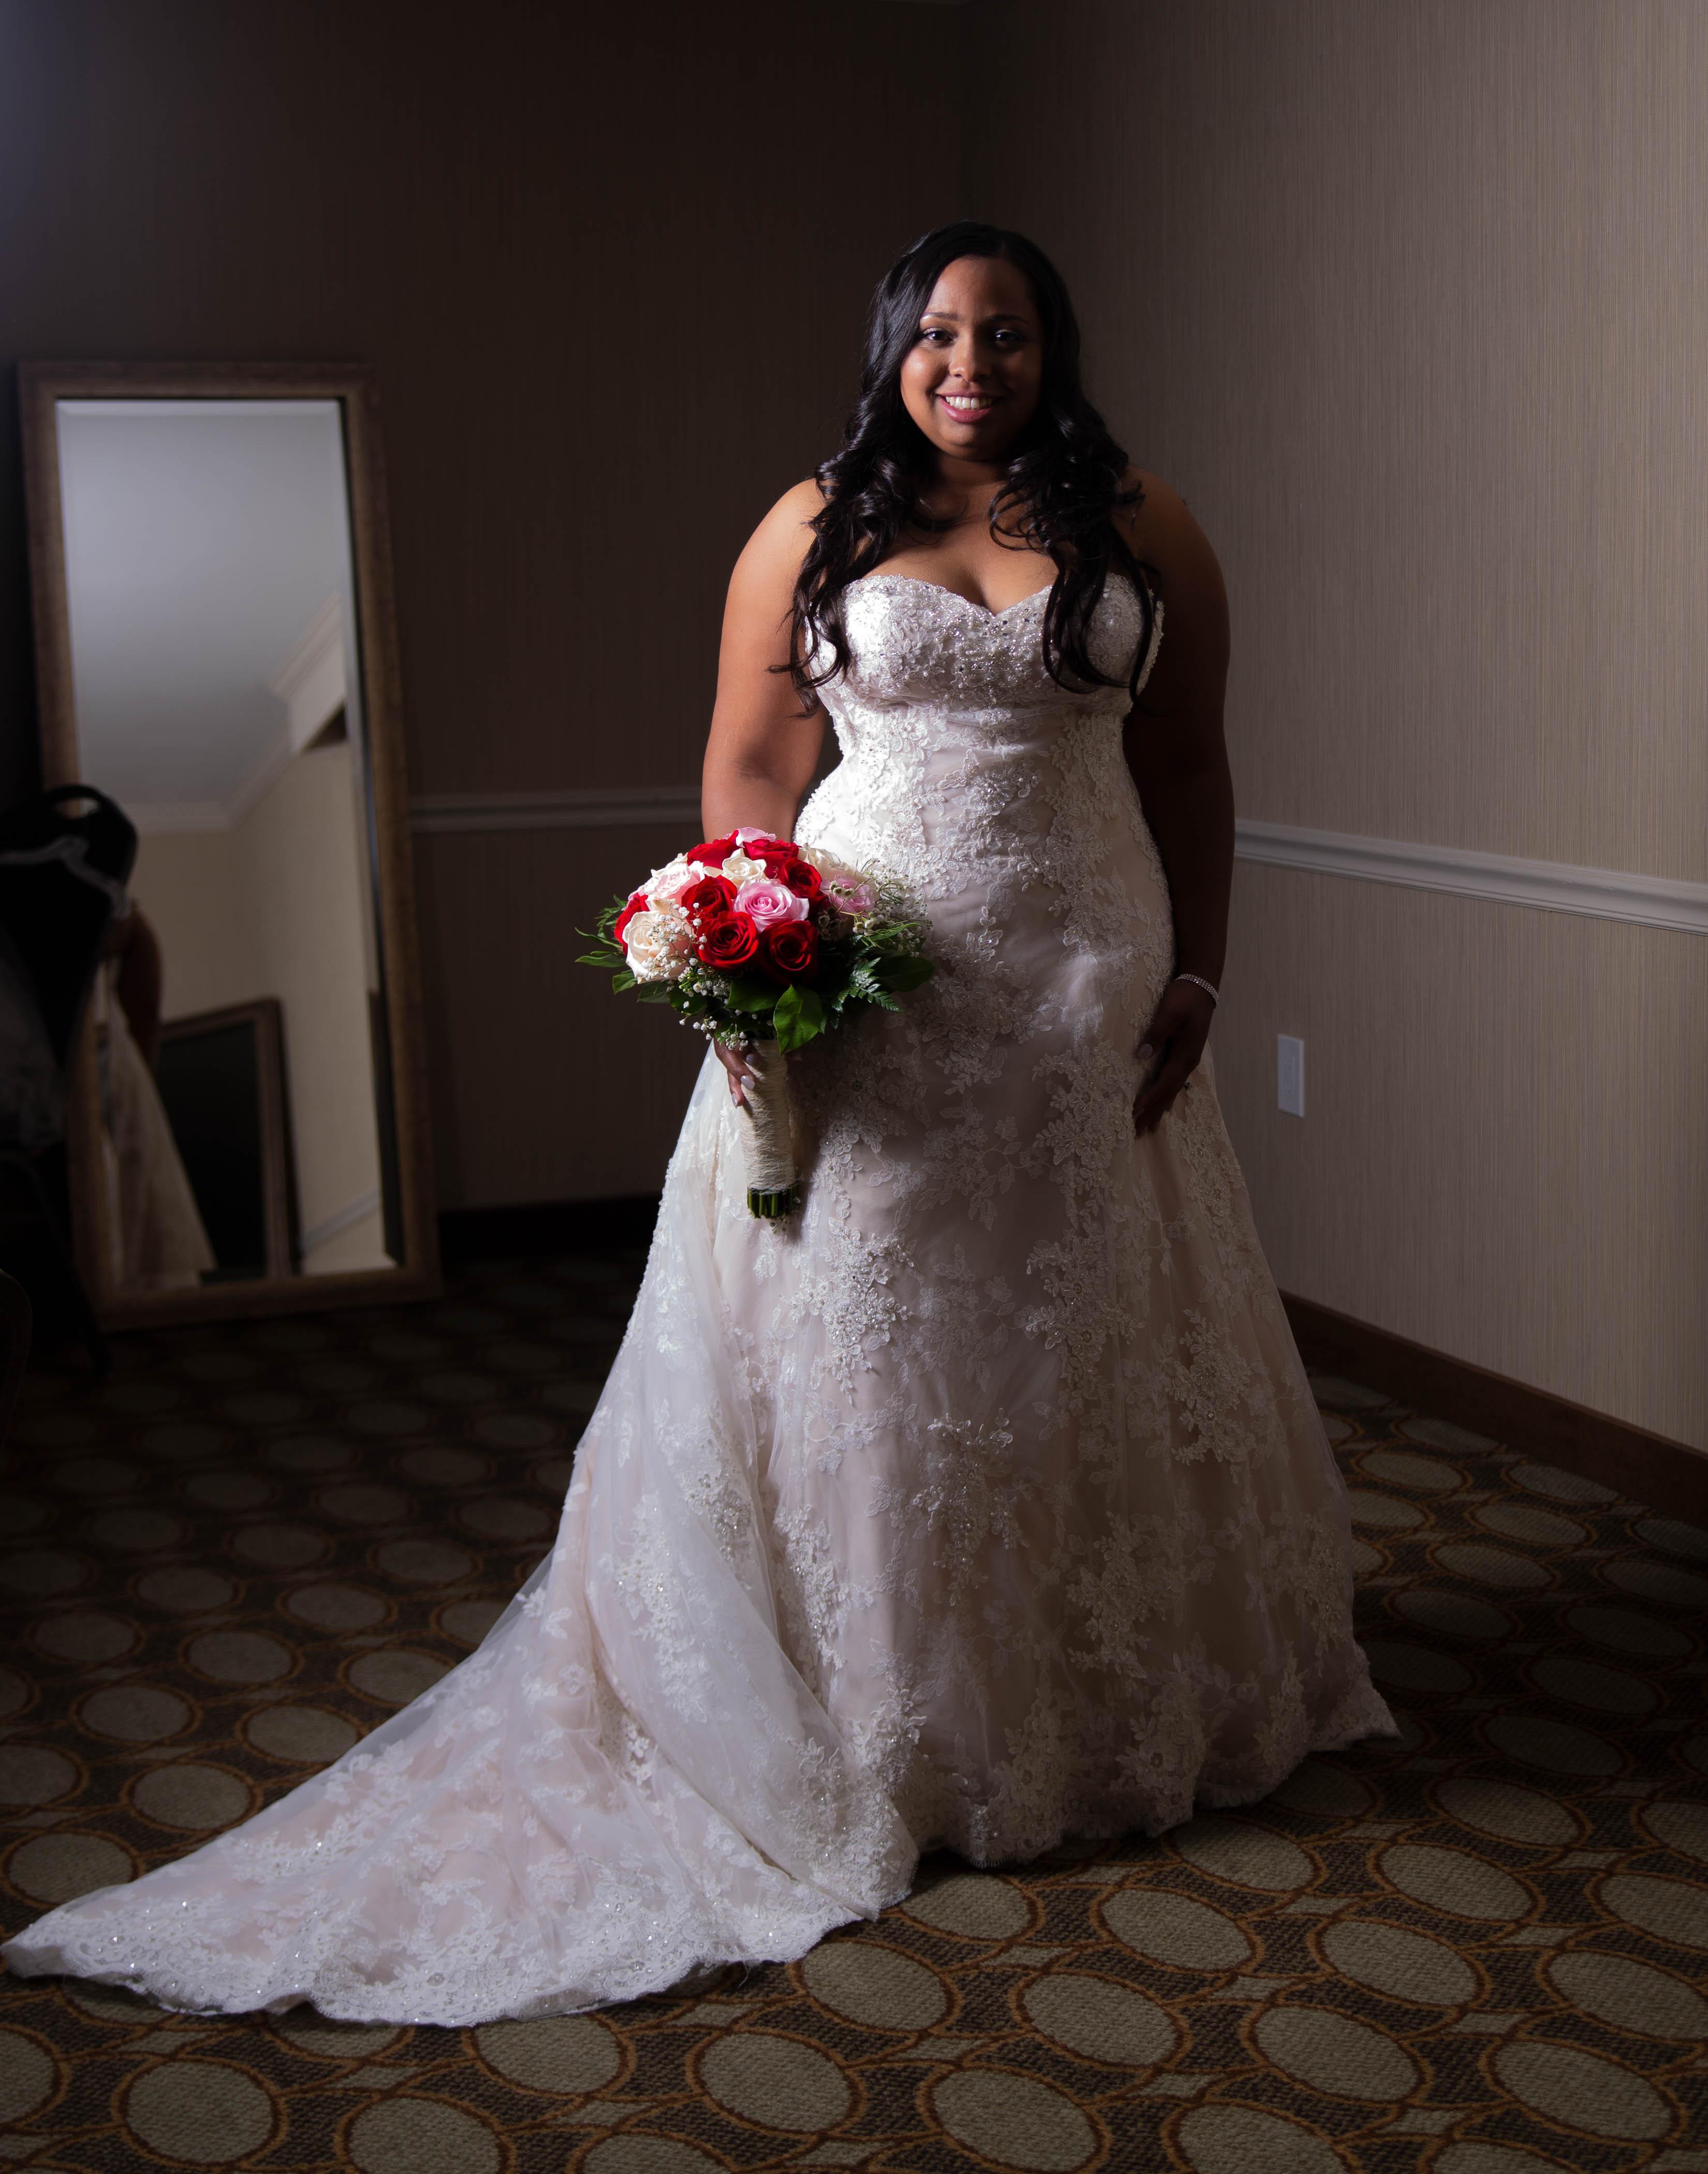 CPH_High-Res-Gaither Wedding2018-103